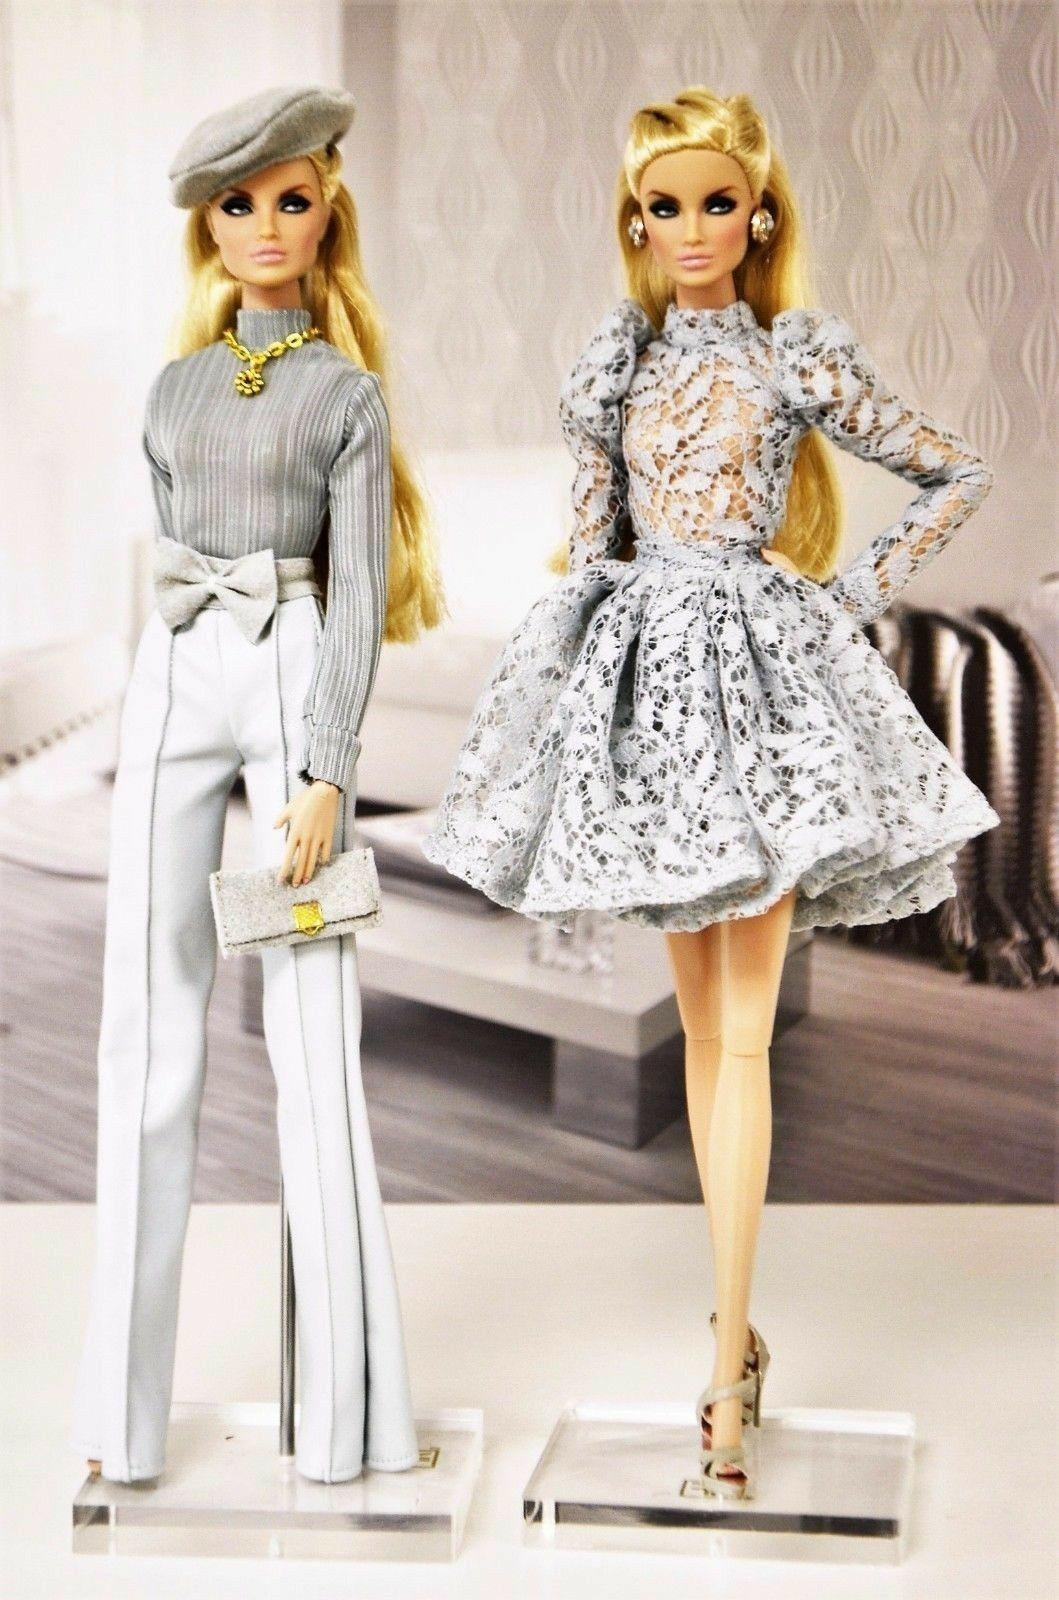 Pin By Cheryl M On Barbie Fashion Barbie Fashion Royalty Fashion Creator